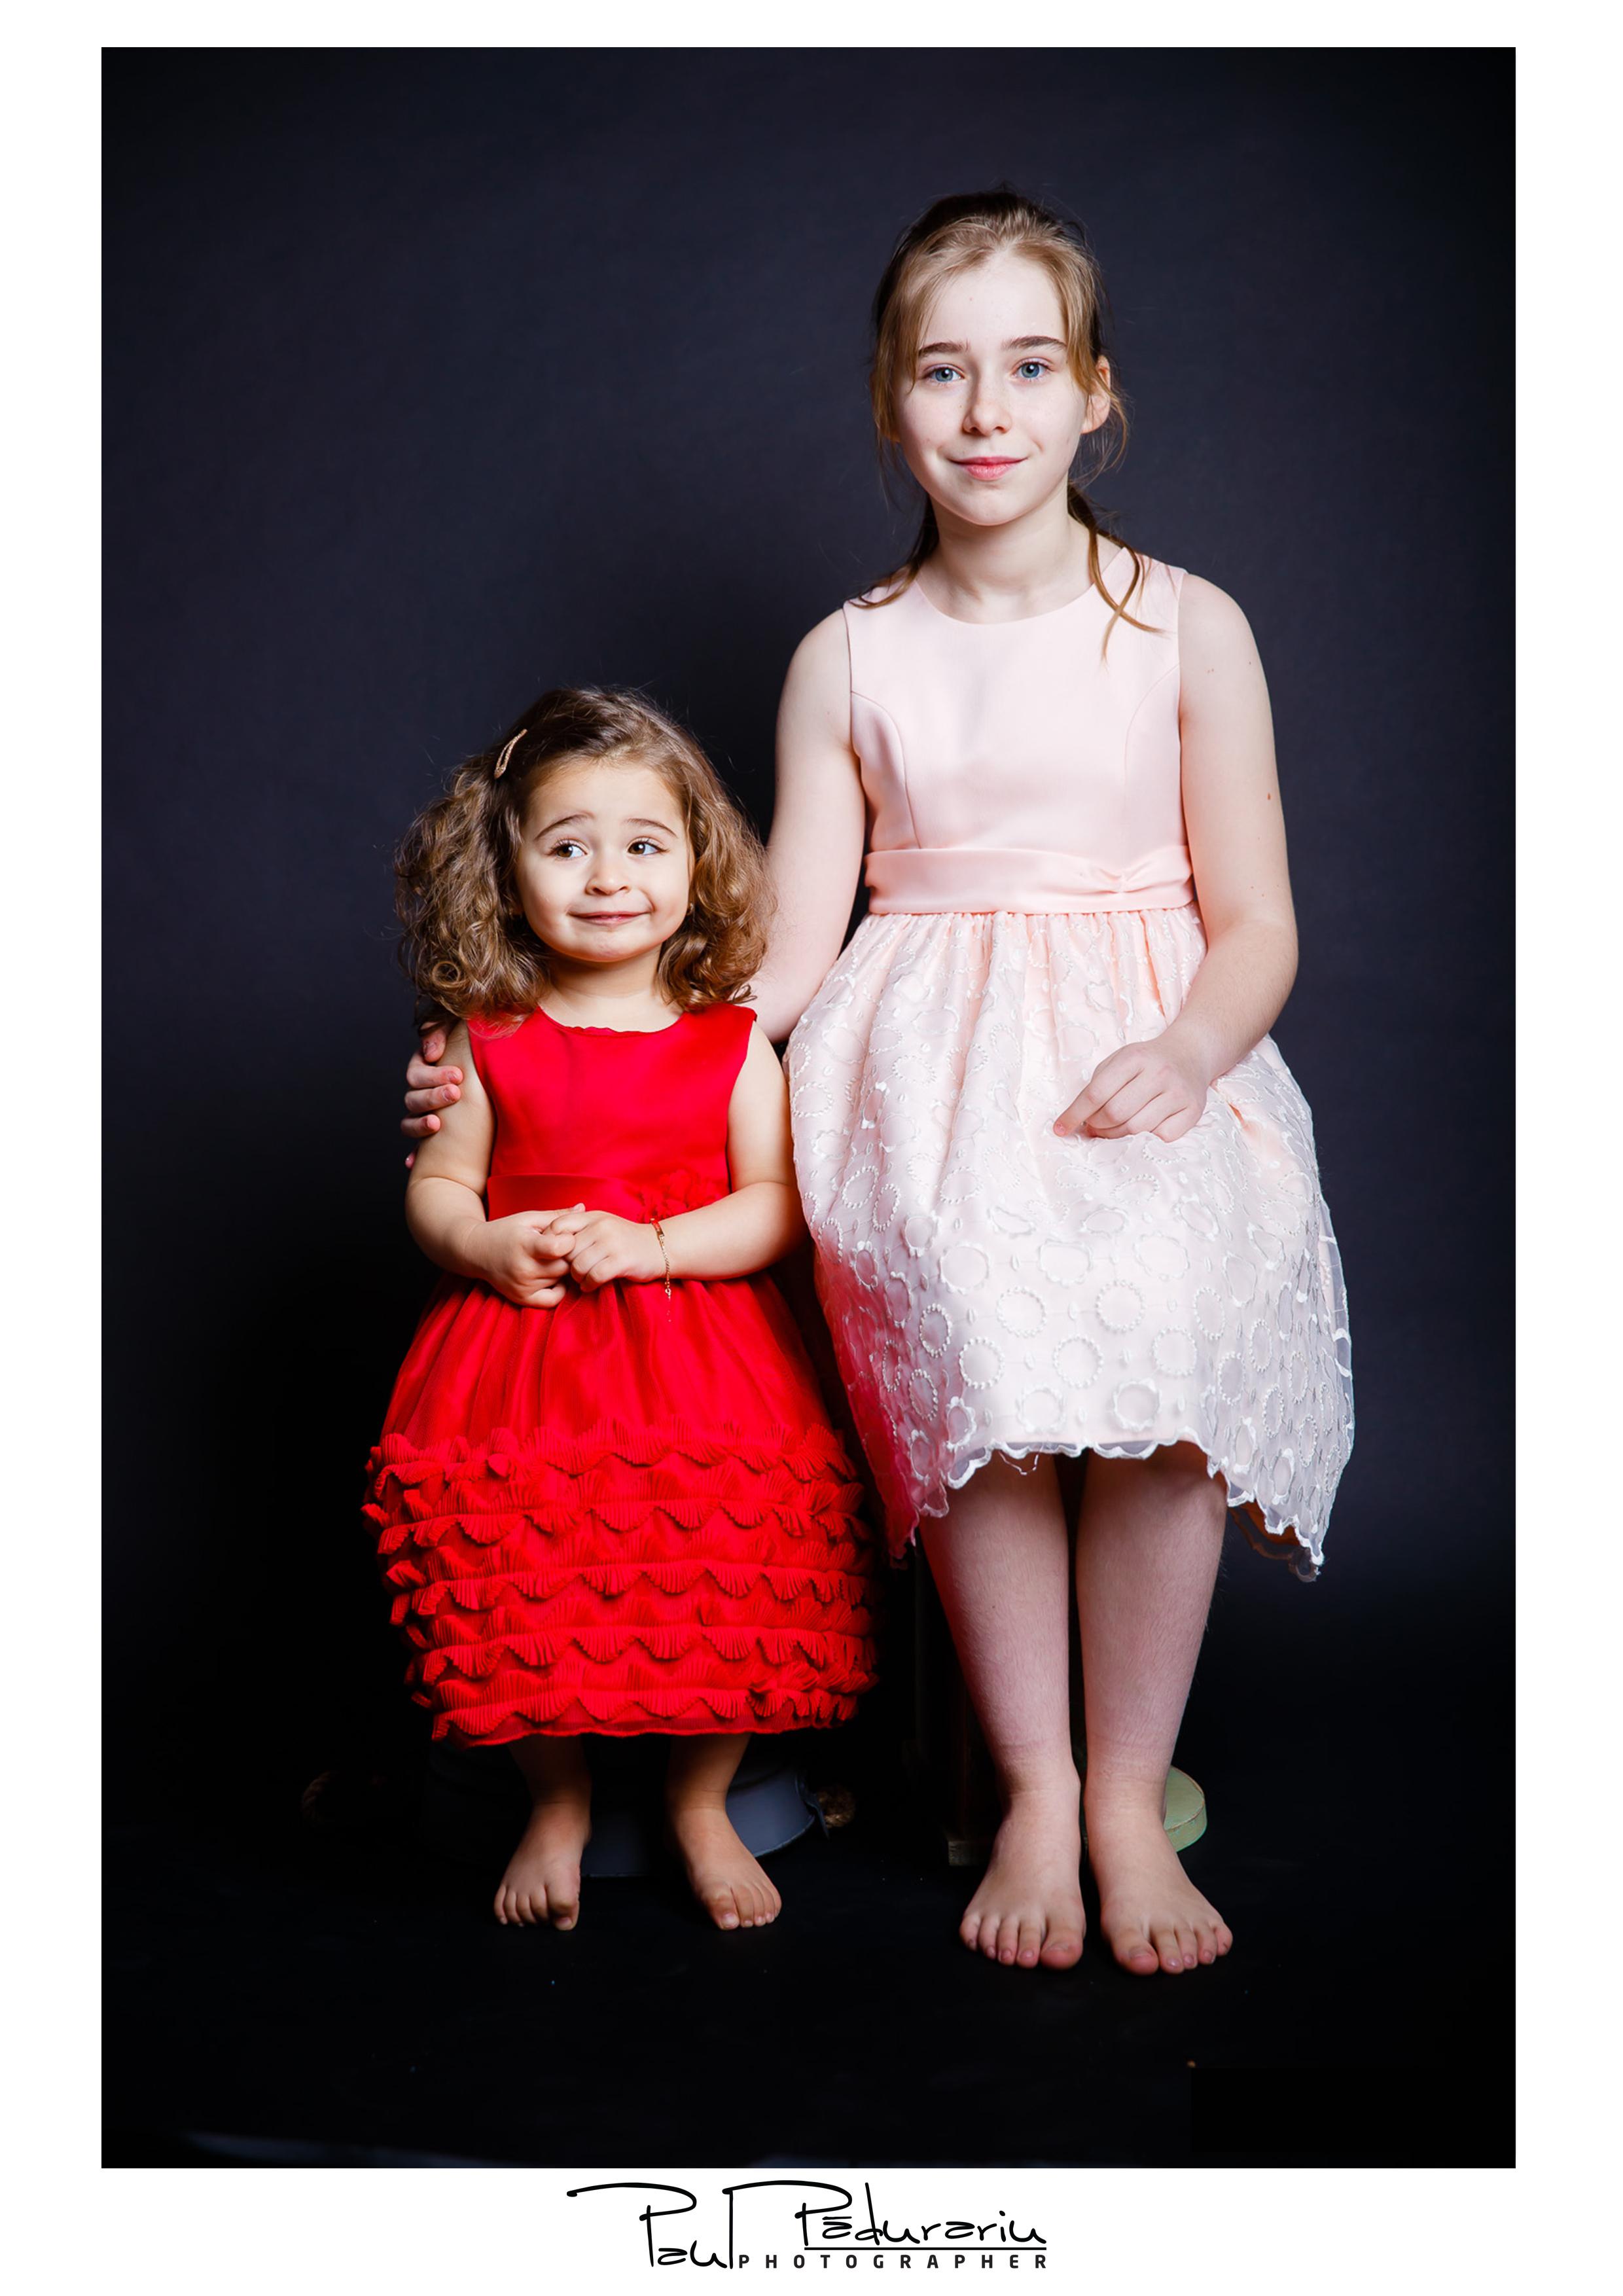 Sedinta foto copii peste 1 an studio foto iasi Paul Padurariu